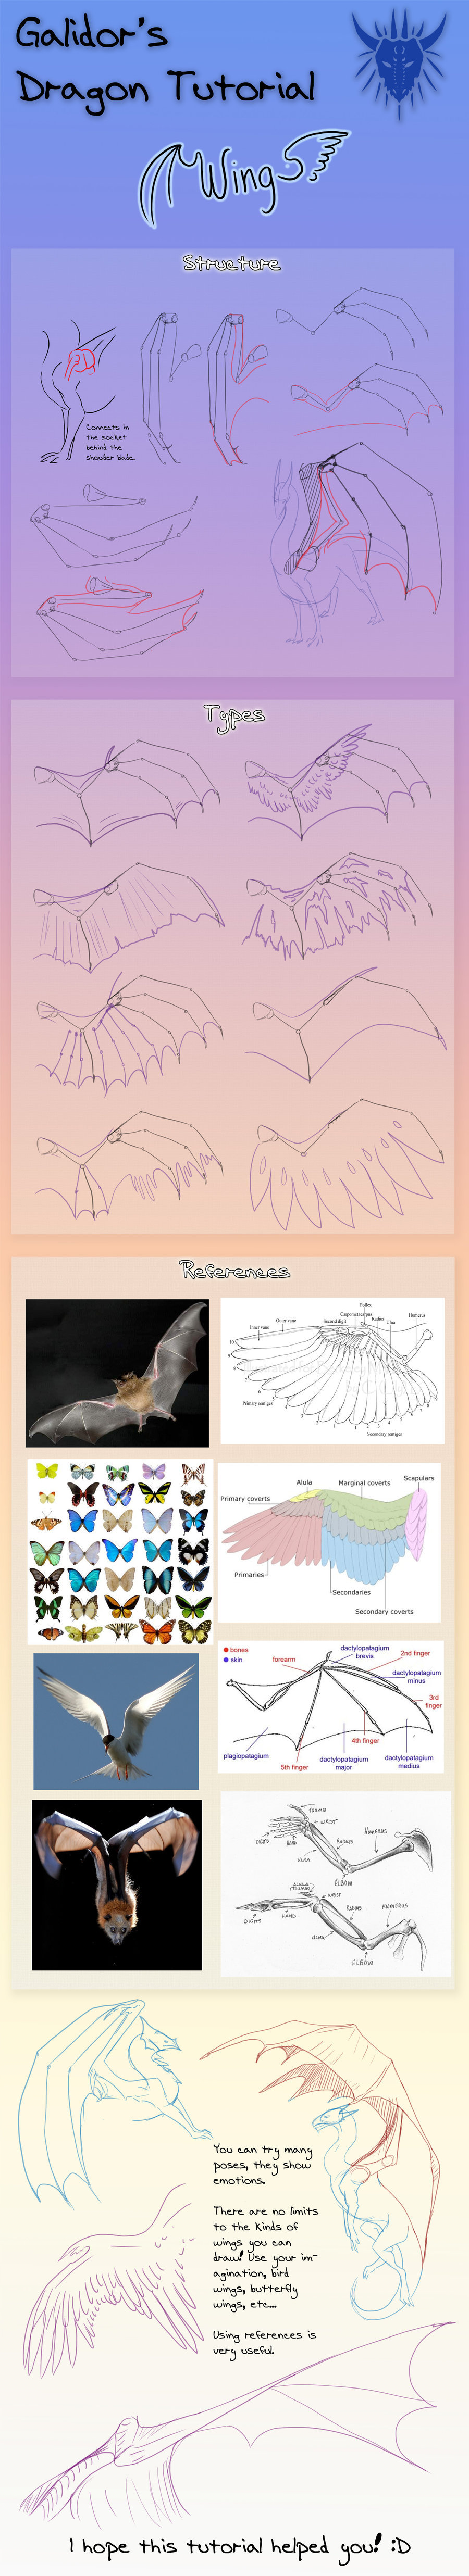 Dragon Wing Tutorial by Galidor-Dragon